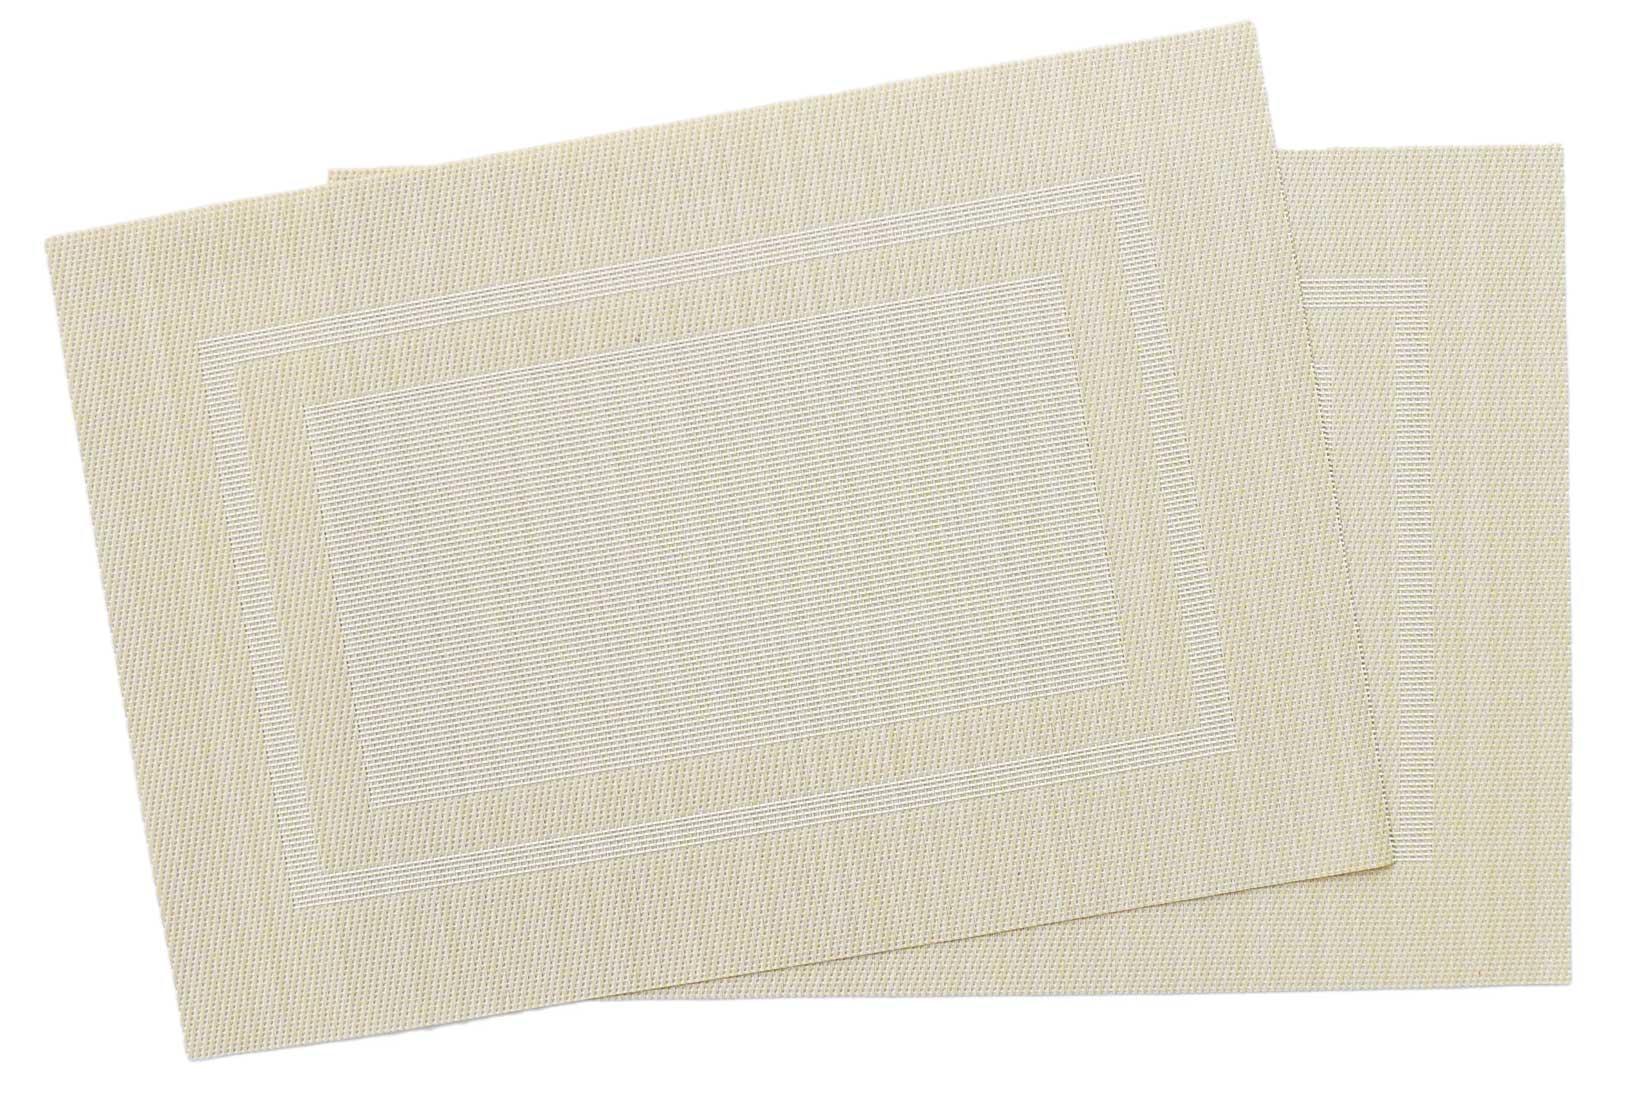 Image of Woven Vinyl White Classic MAT21